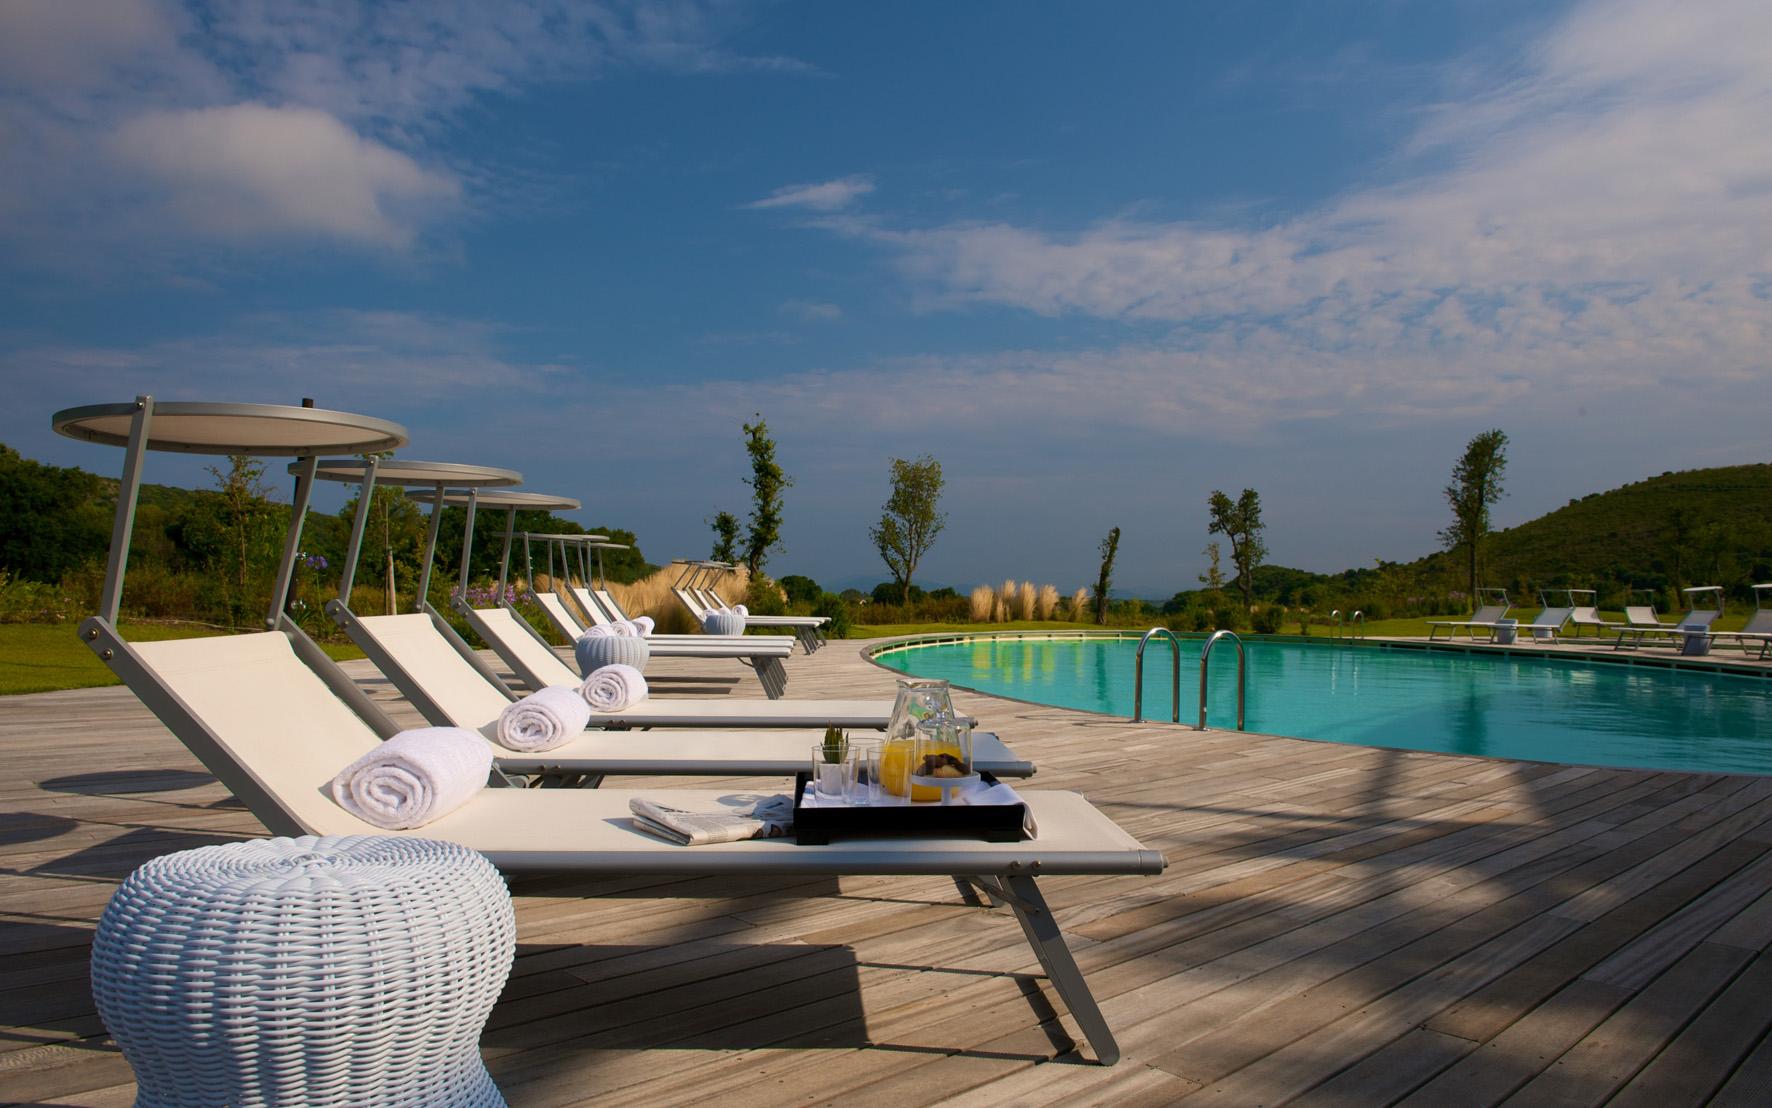 Argenatrio Golf Resort in Toscana